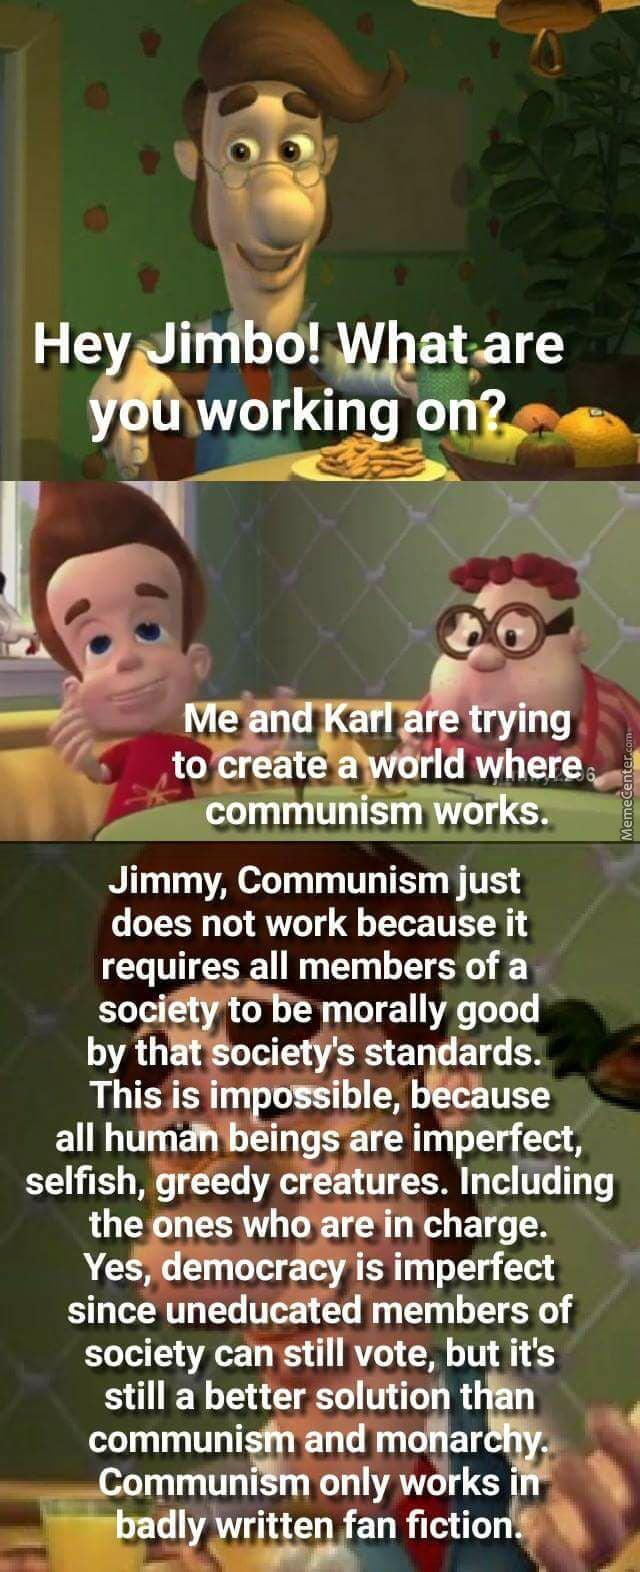 Communism is unrealistic - meme